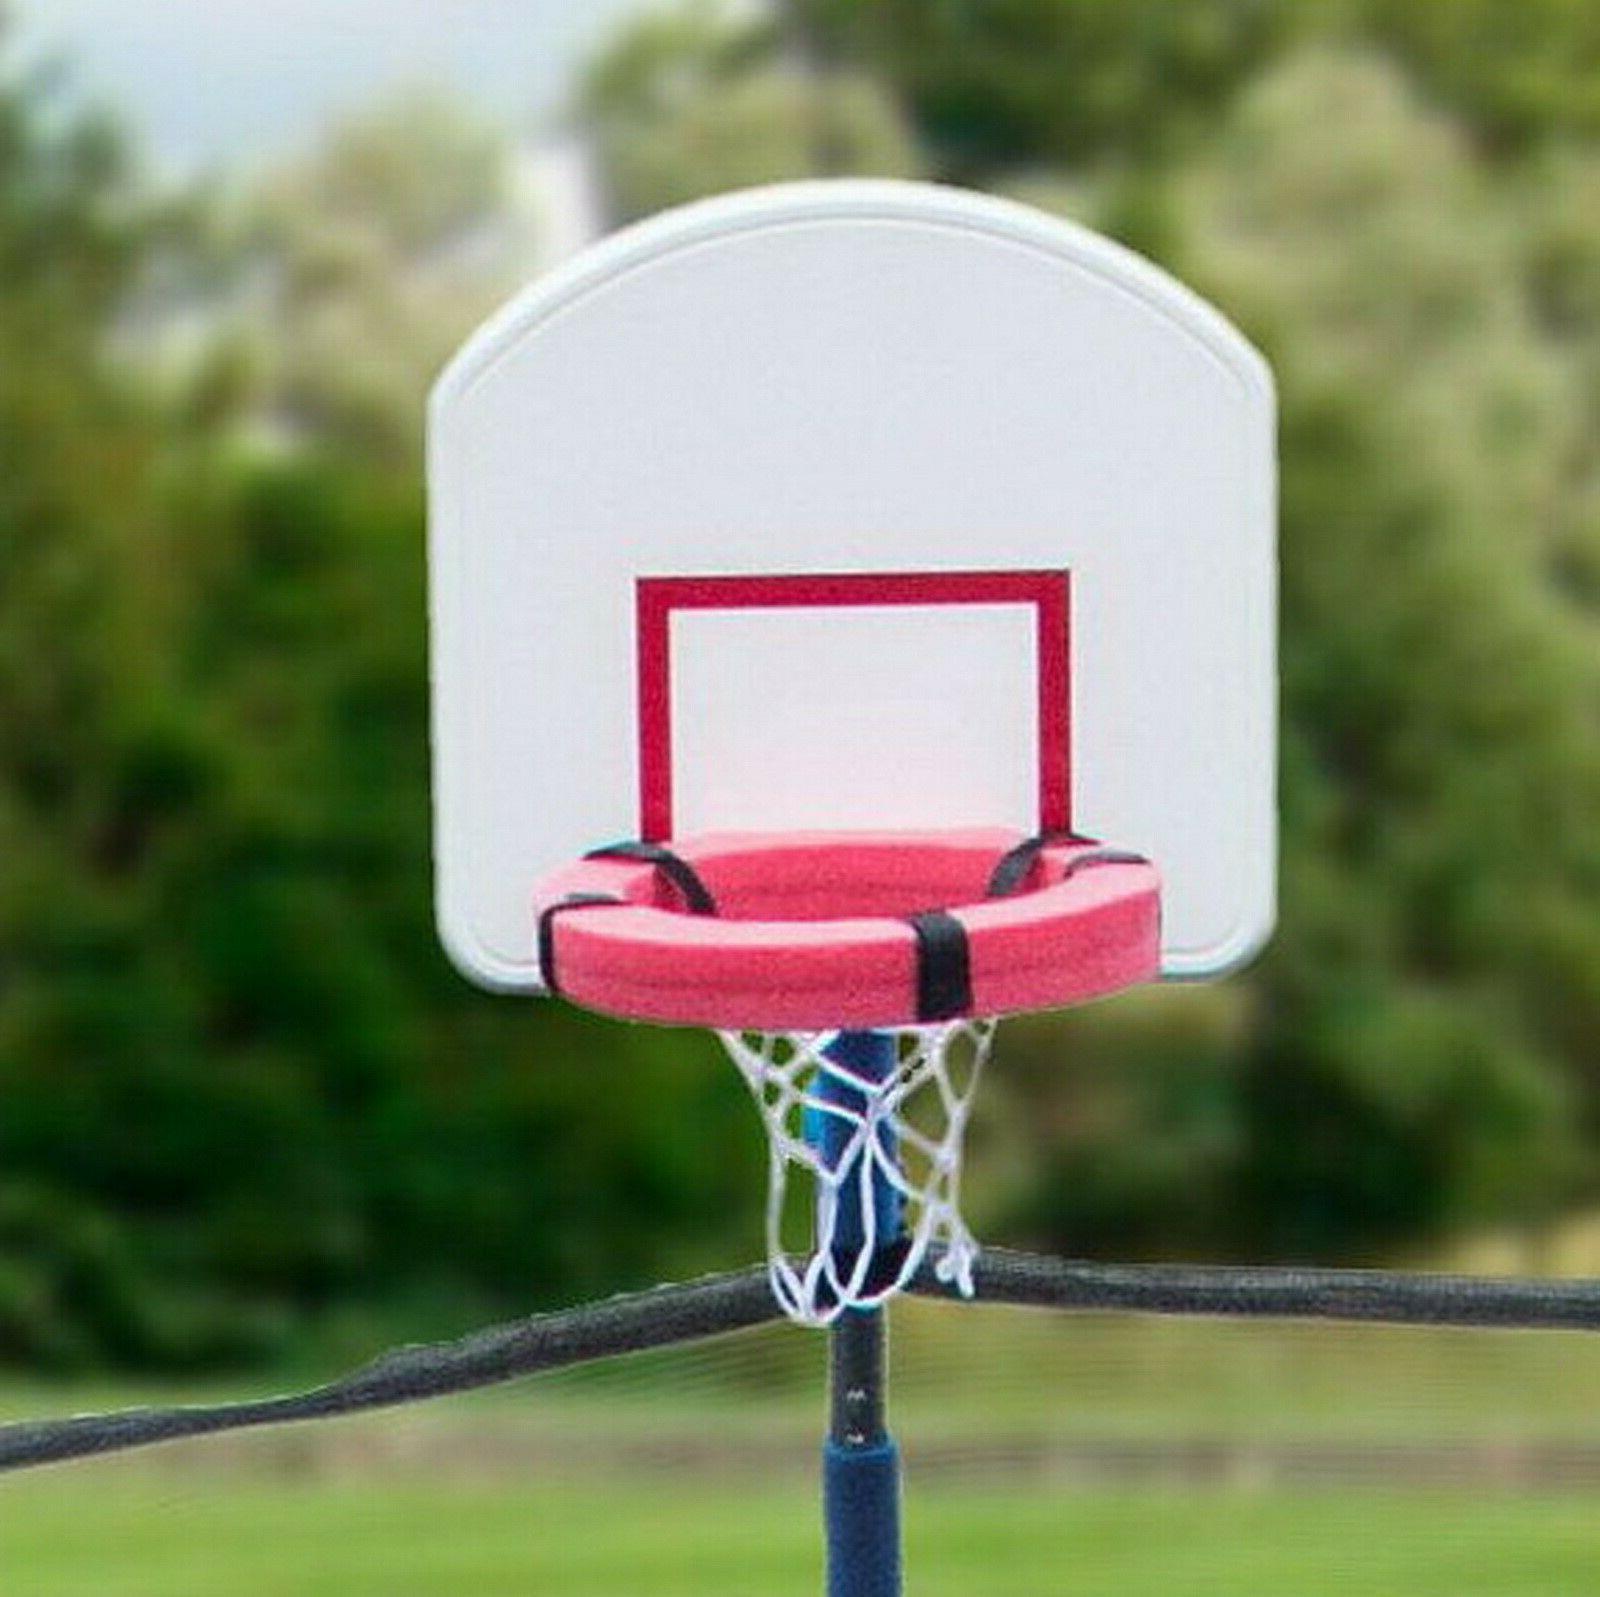 Round Basketball Goal & Enclosure Pro